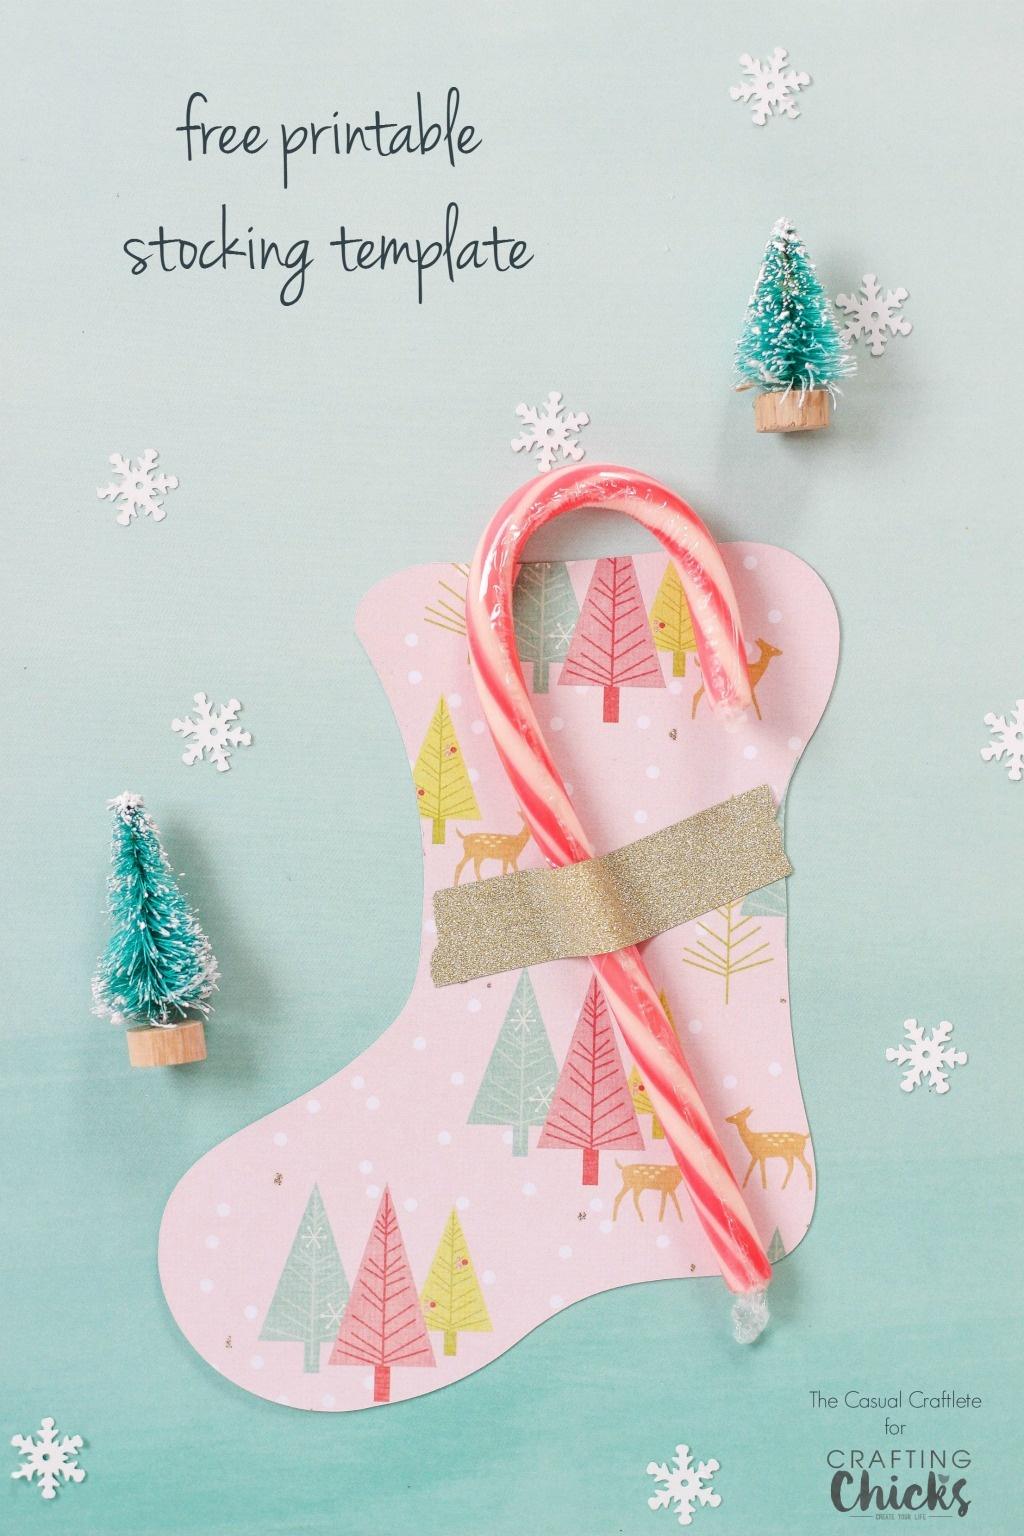 Free Printable Stocking Template - Free Printable Christmas Stocking Template